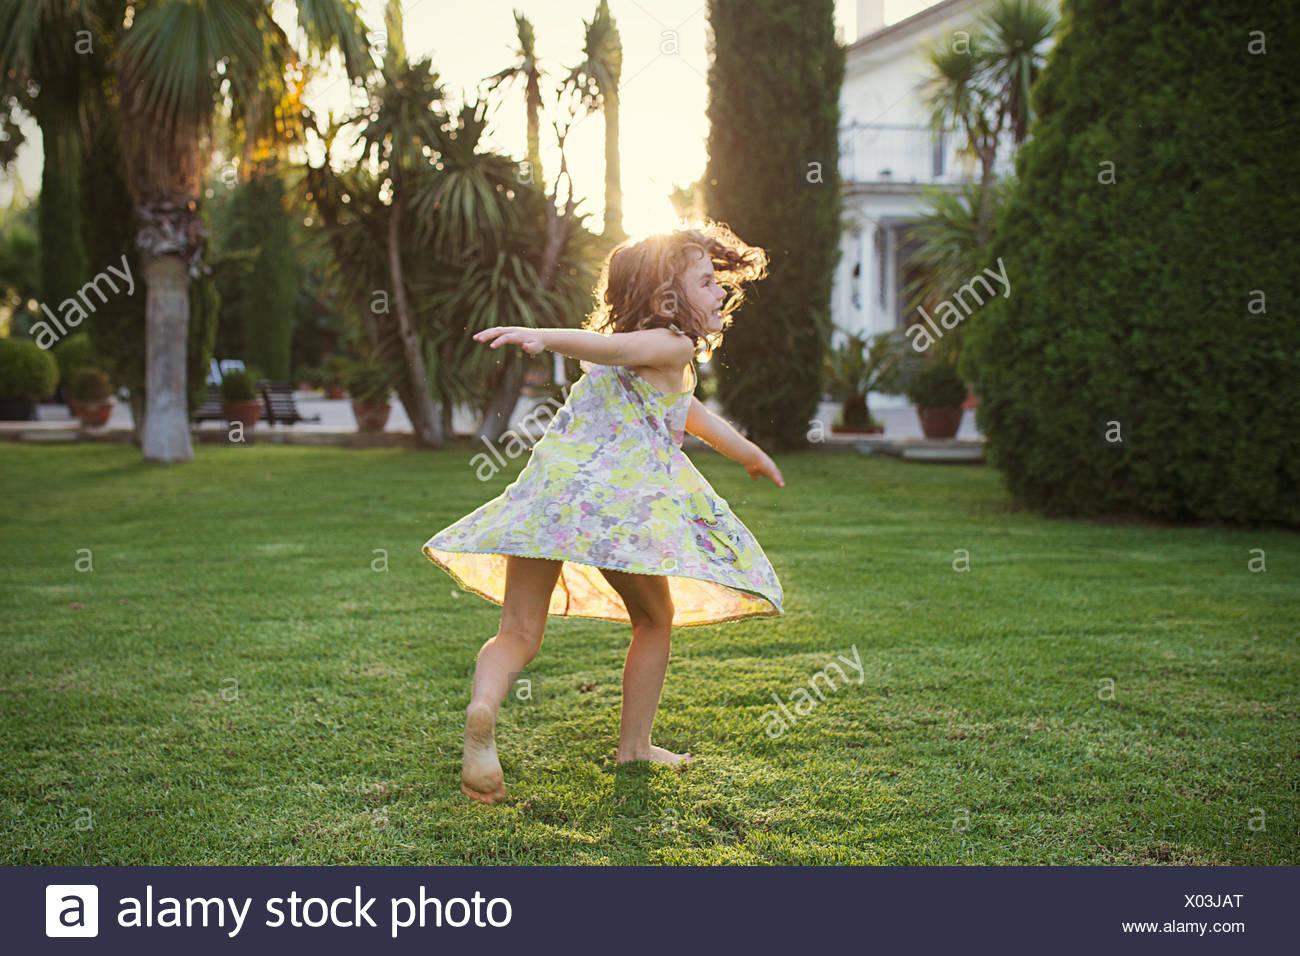 Girl spinning around in garden - Stock Image